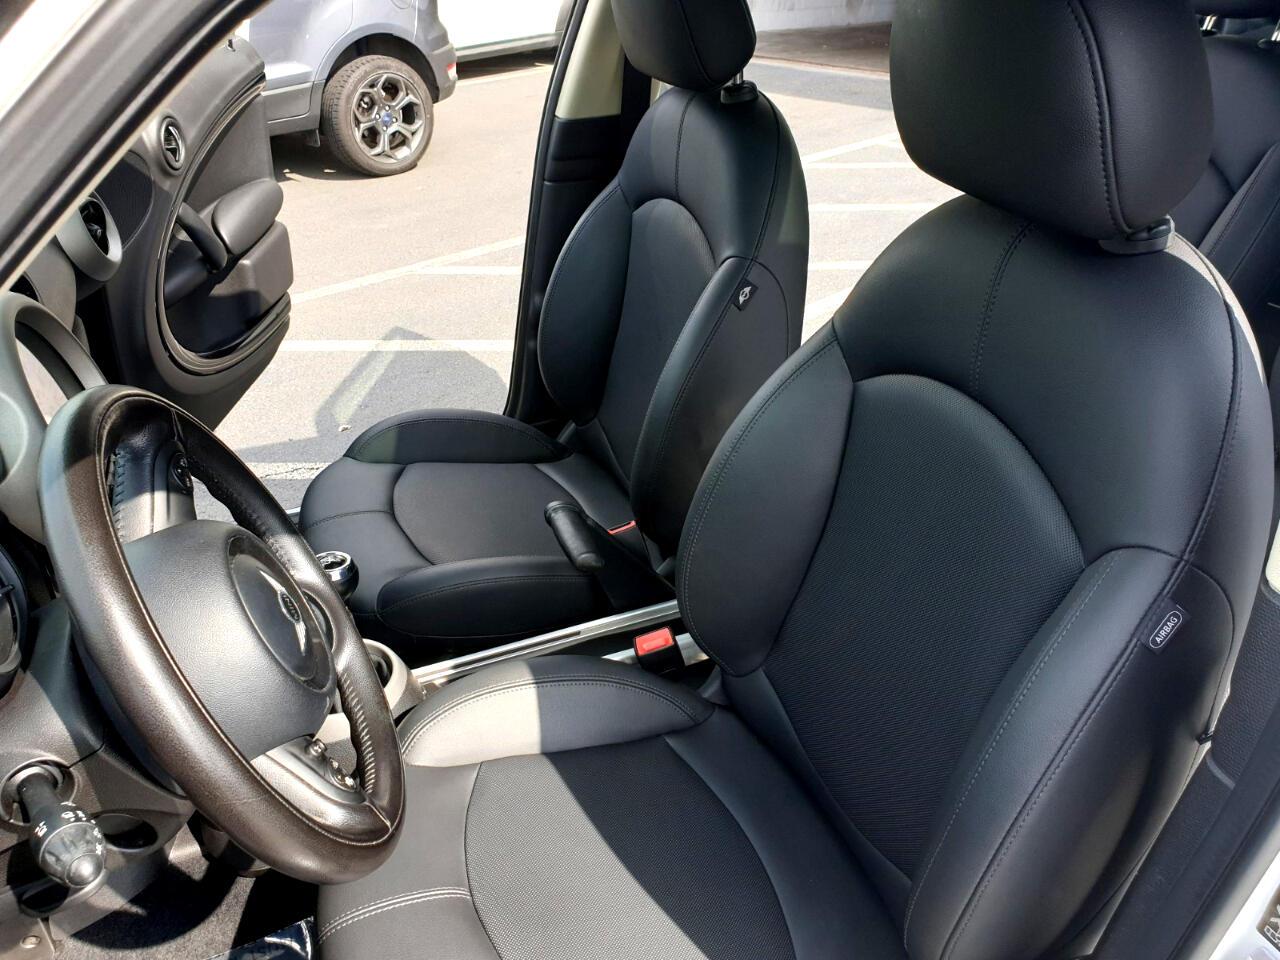 2012 MINI Cooper Countryman AWD 4dr S ALL4